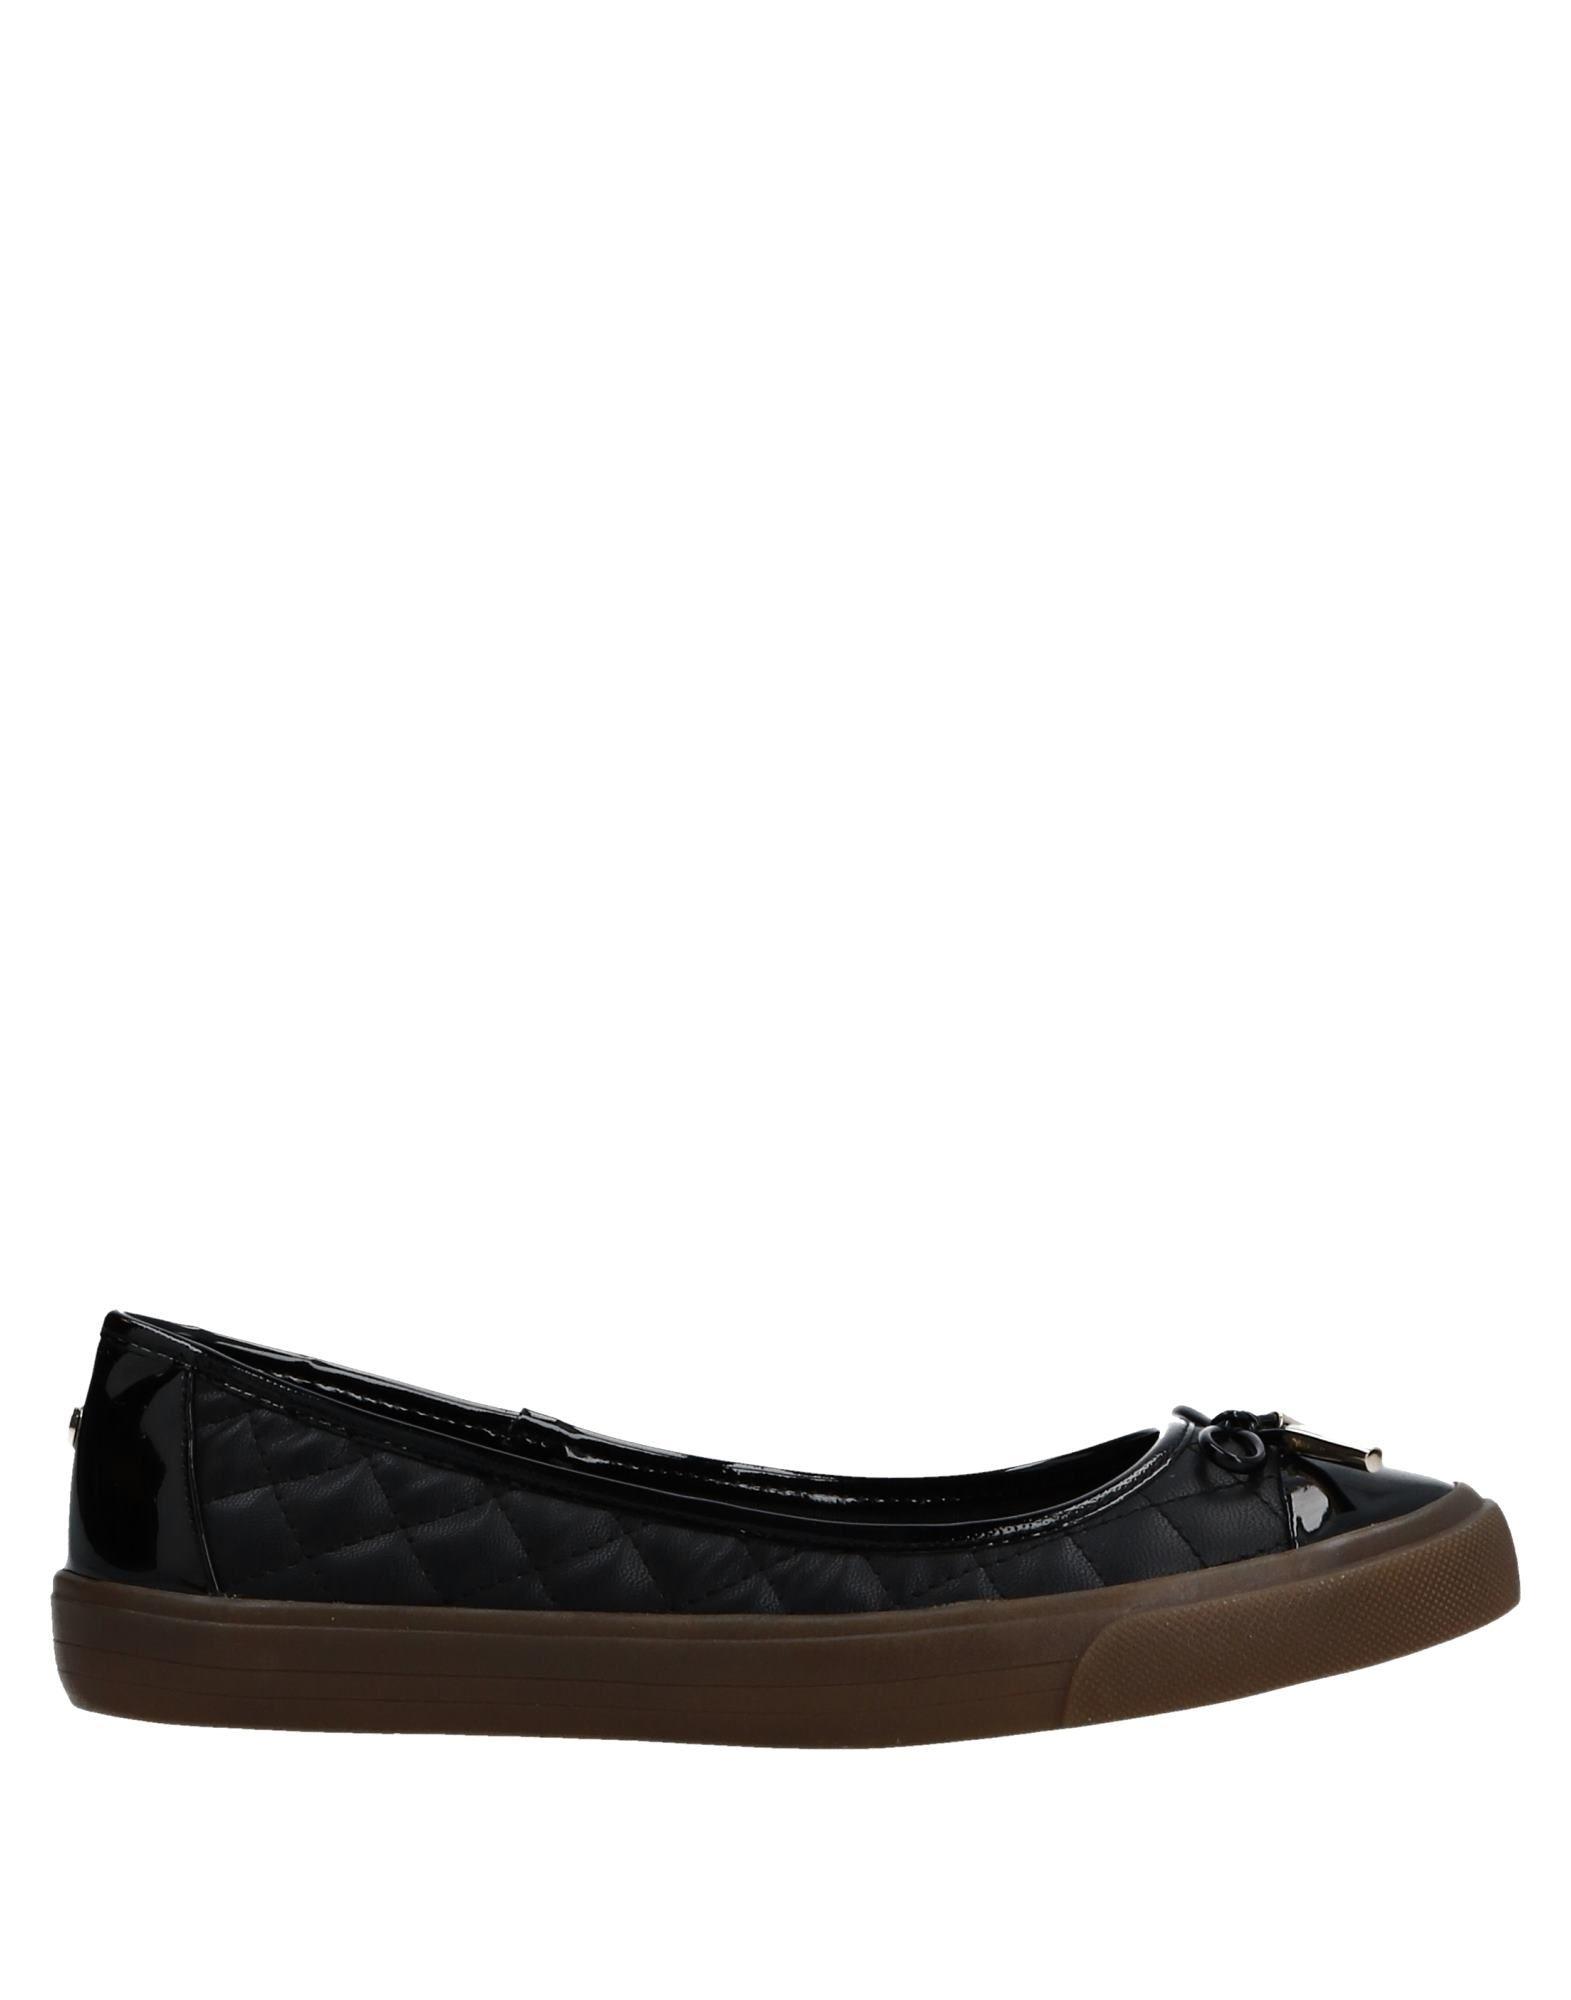 Armani Qualität Jeans Ballerinas Damen  11527747WL Gute Qualität Armani beliebte Schuhe 2a0a3c